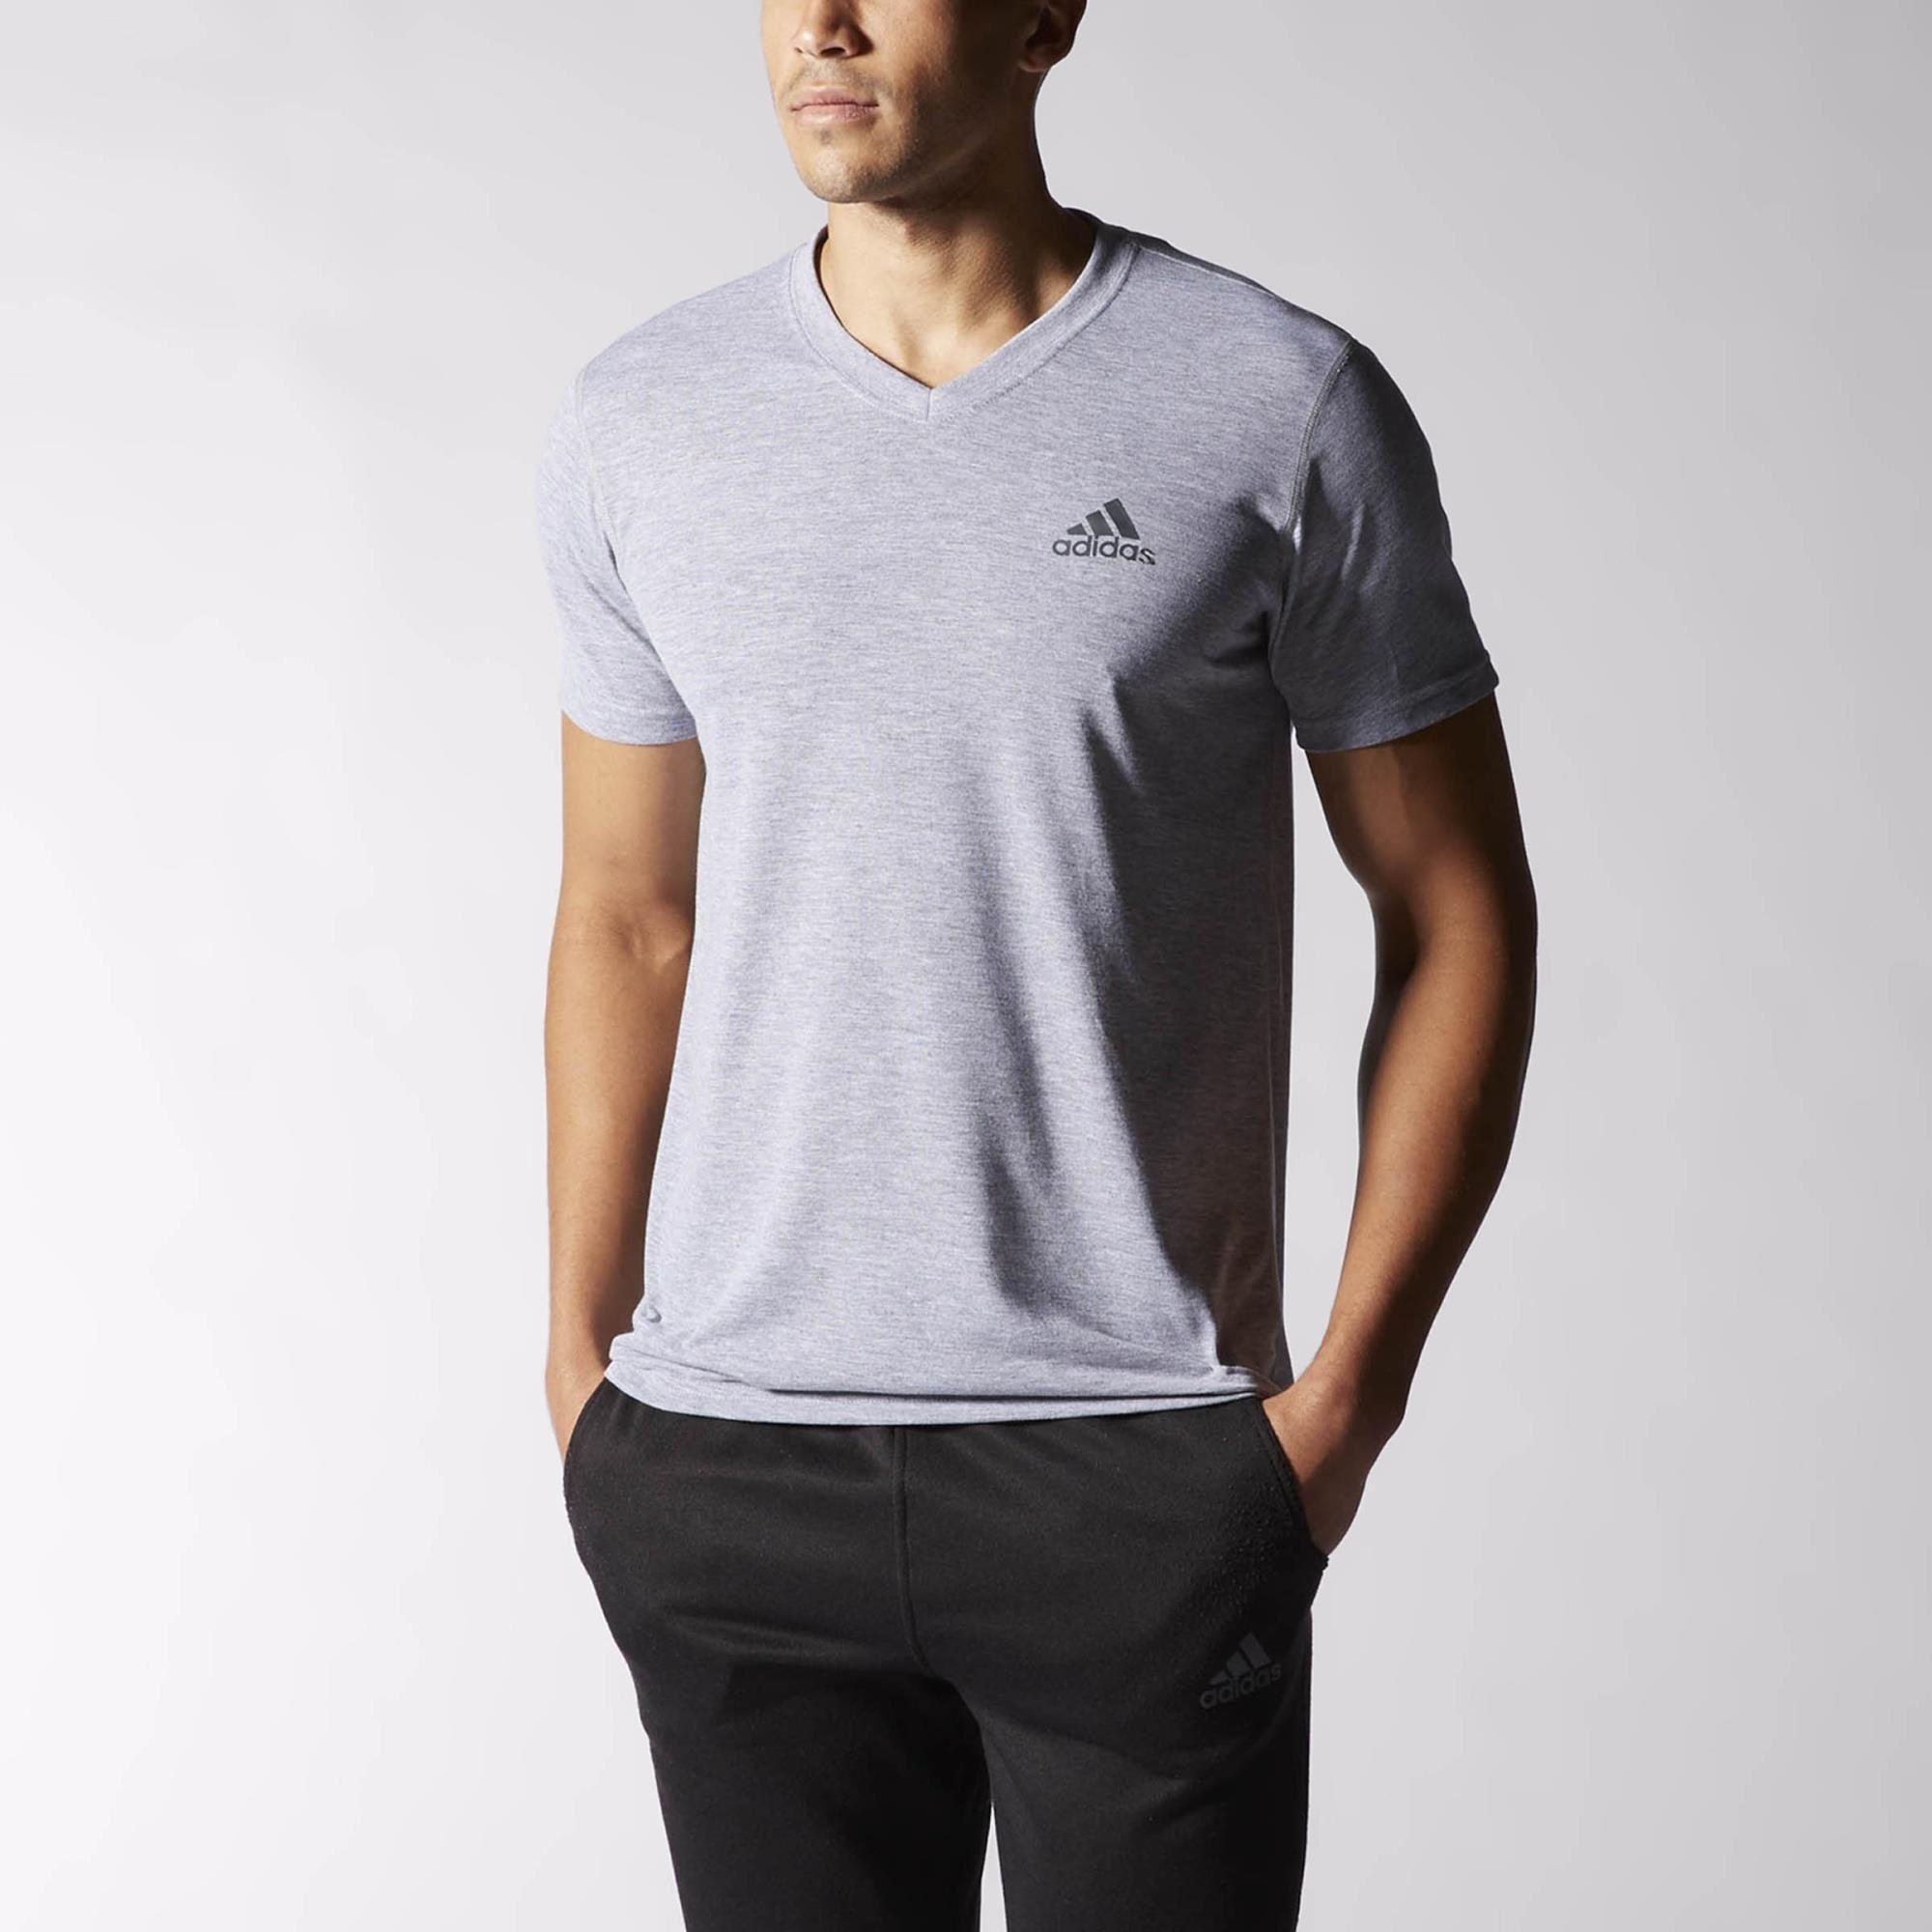 adidas Ultimate V-neck Tee | adidas US | Men short sleeve ...